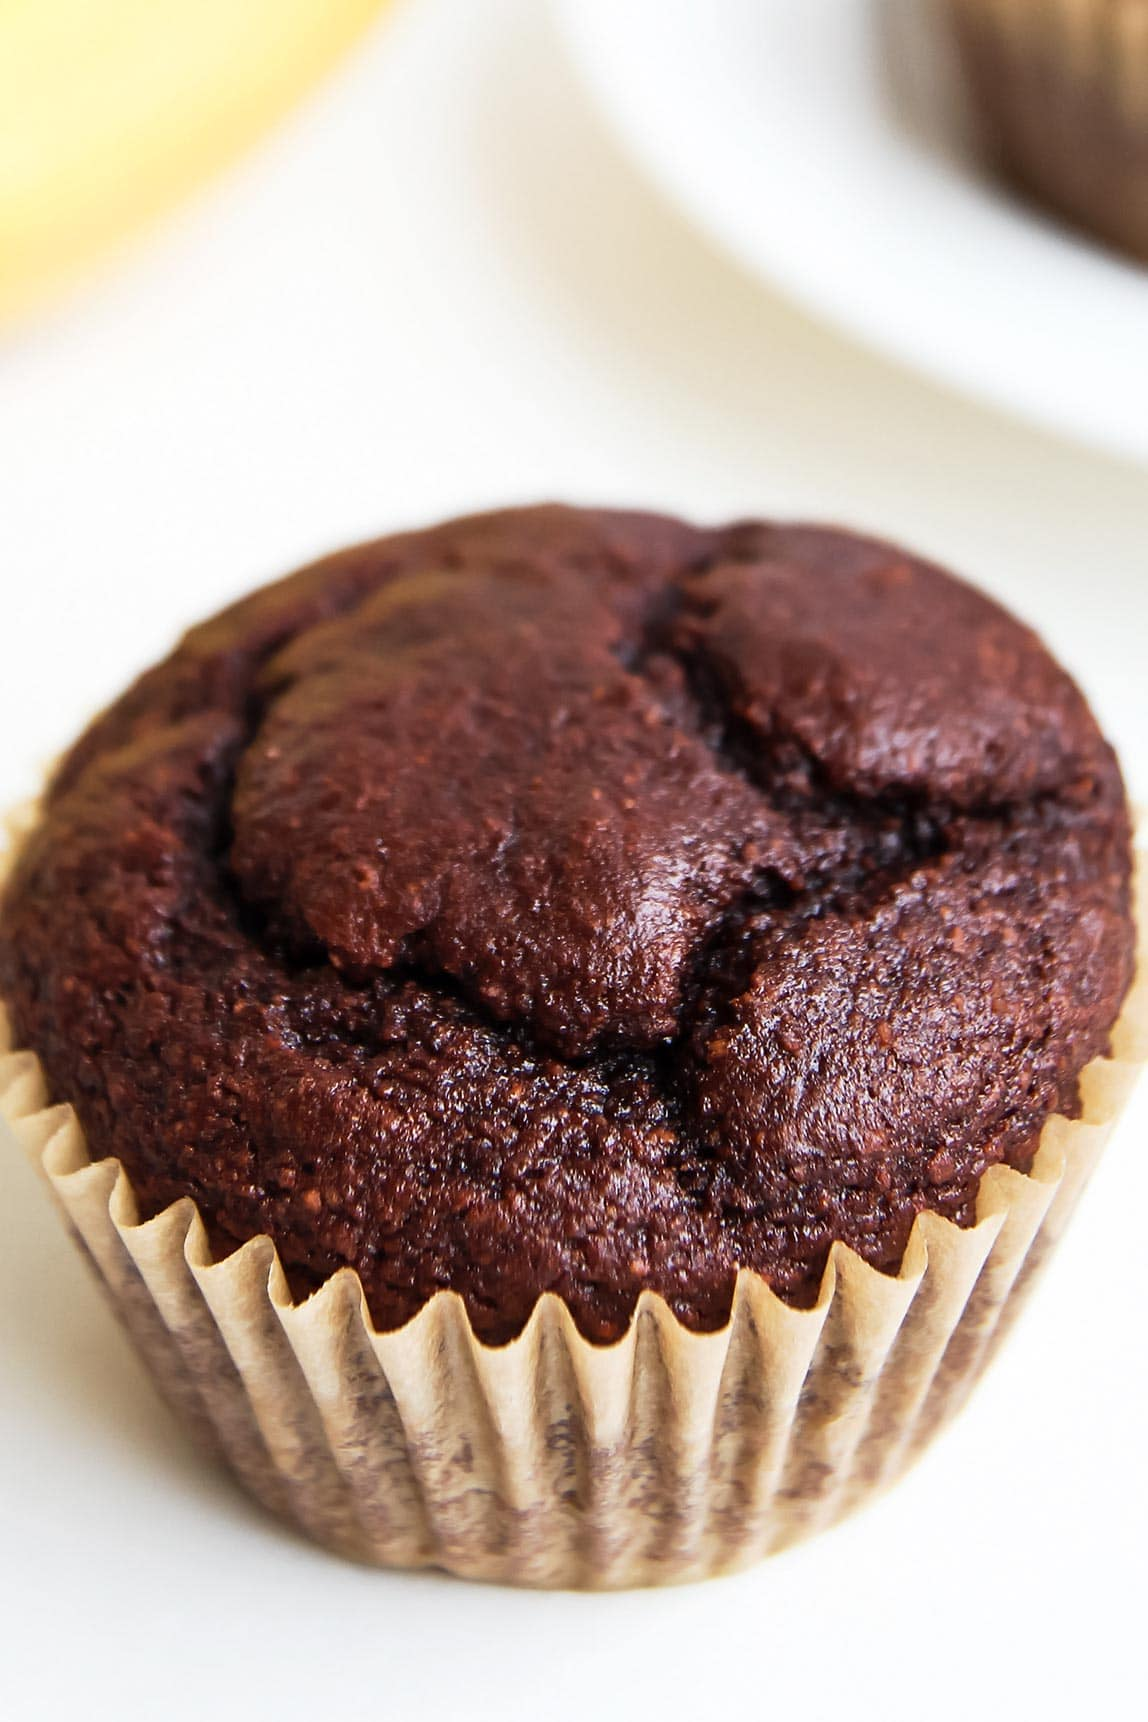 Closeup of Gluten Free Chocolate Banana Muffin